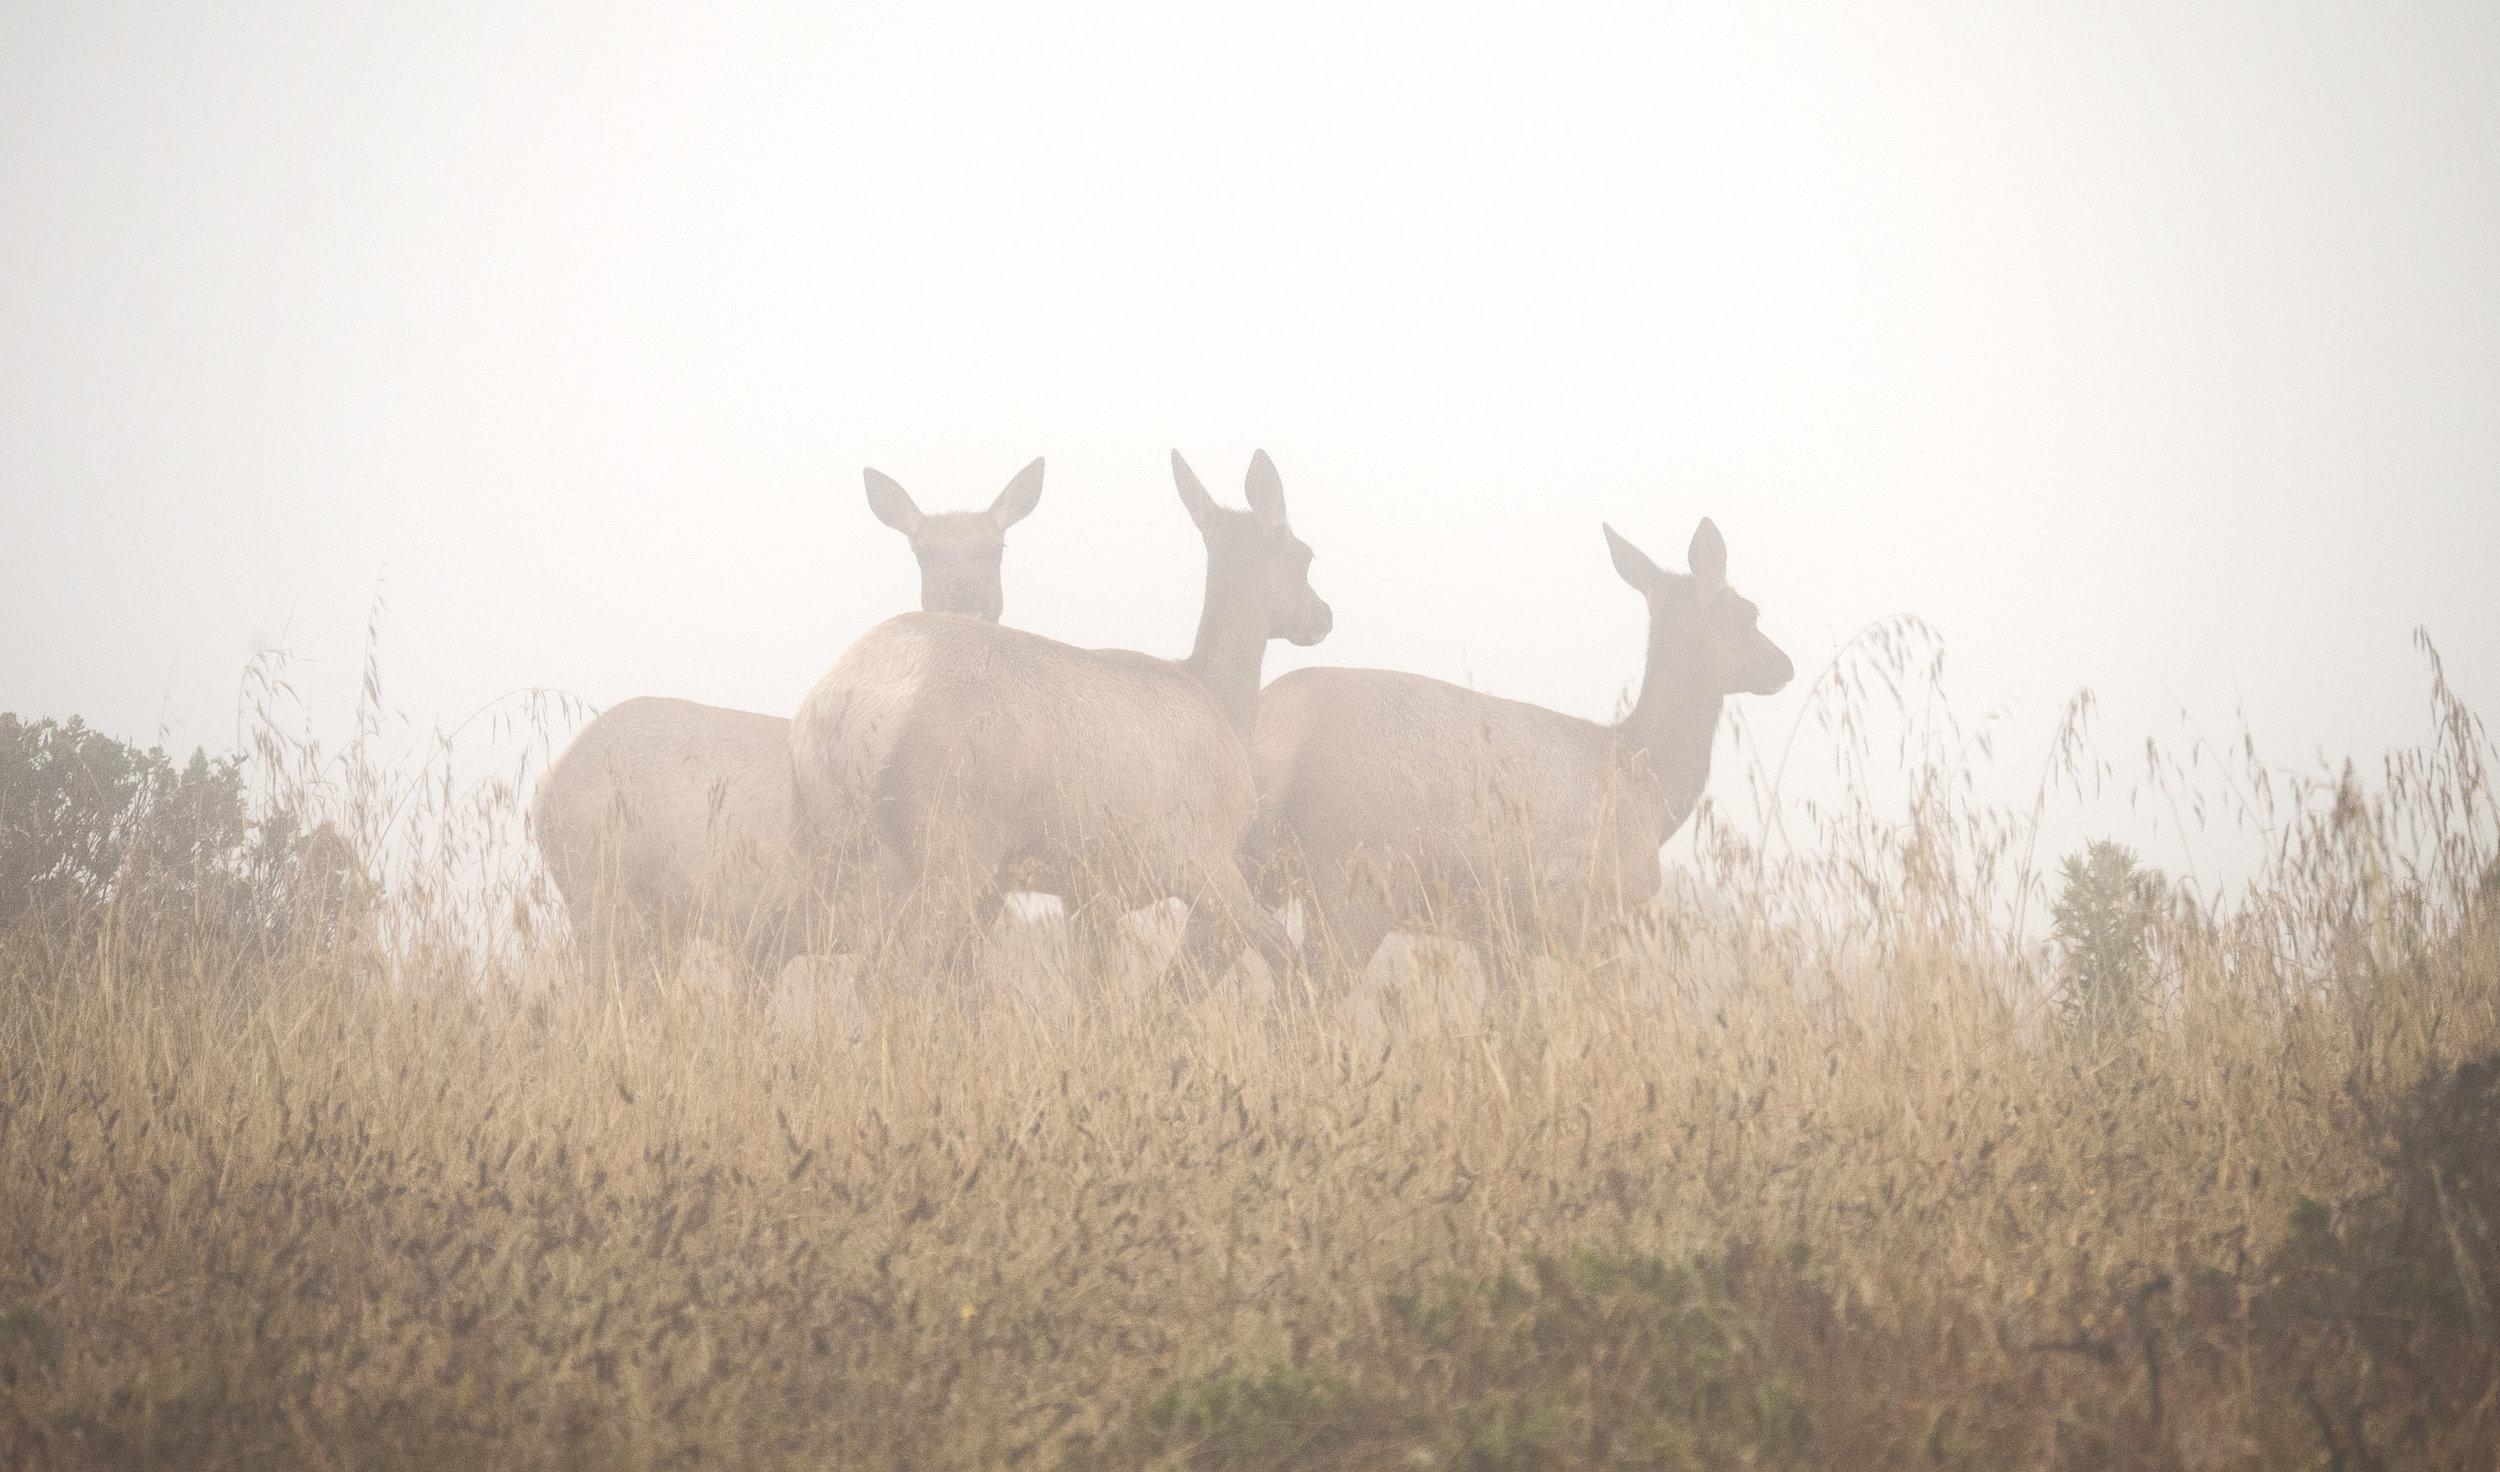 Tule Elk / Photo by Chuck